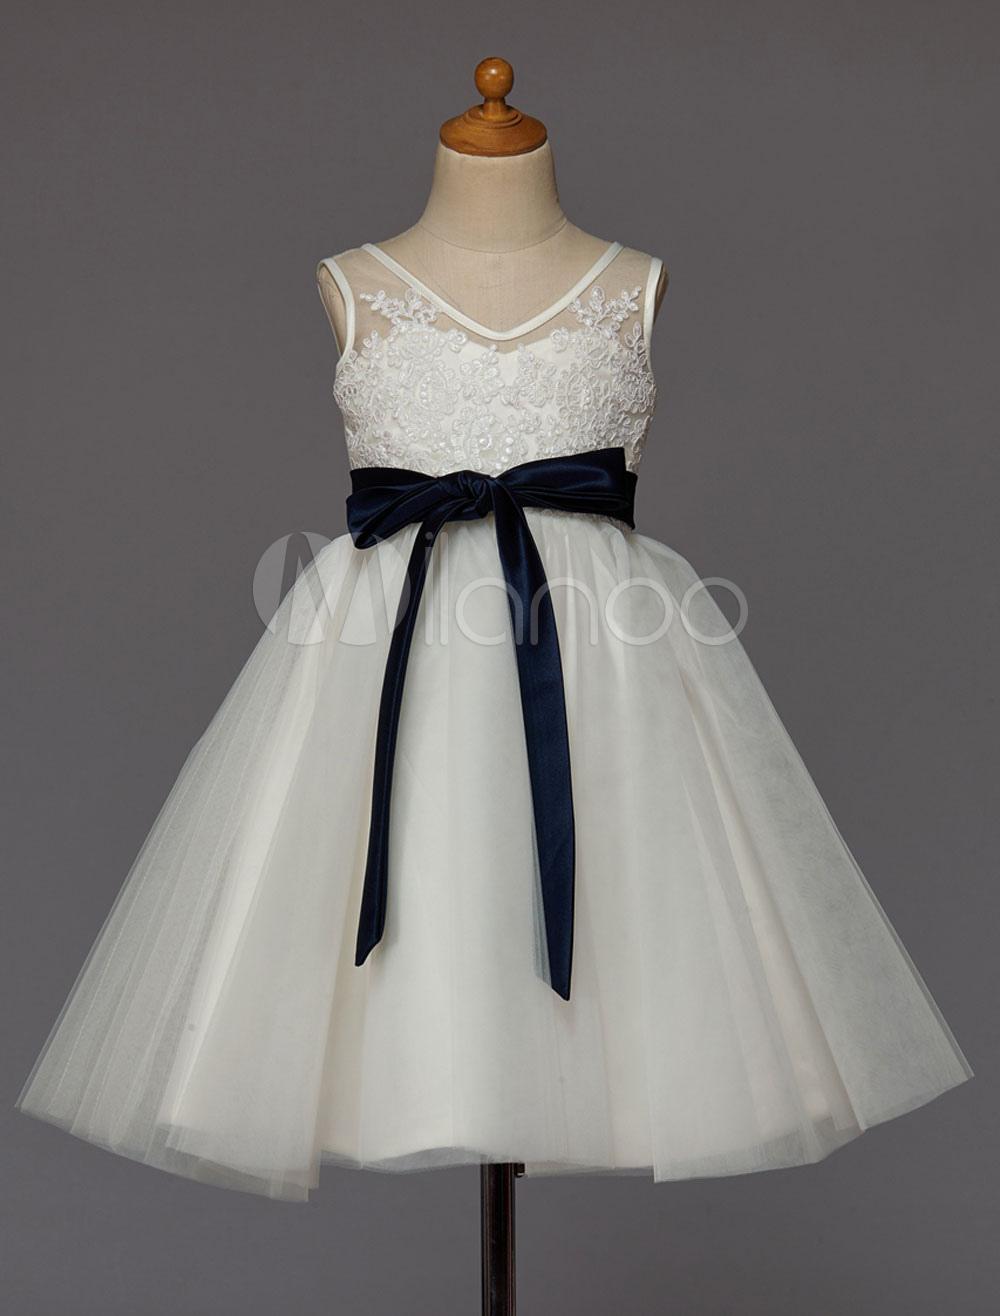 Ivory Flower Girl Dress Lace Tulle Tutu Dress Ribbon Bow Sash Short Kids Party Dresses